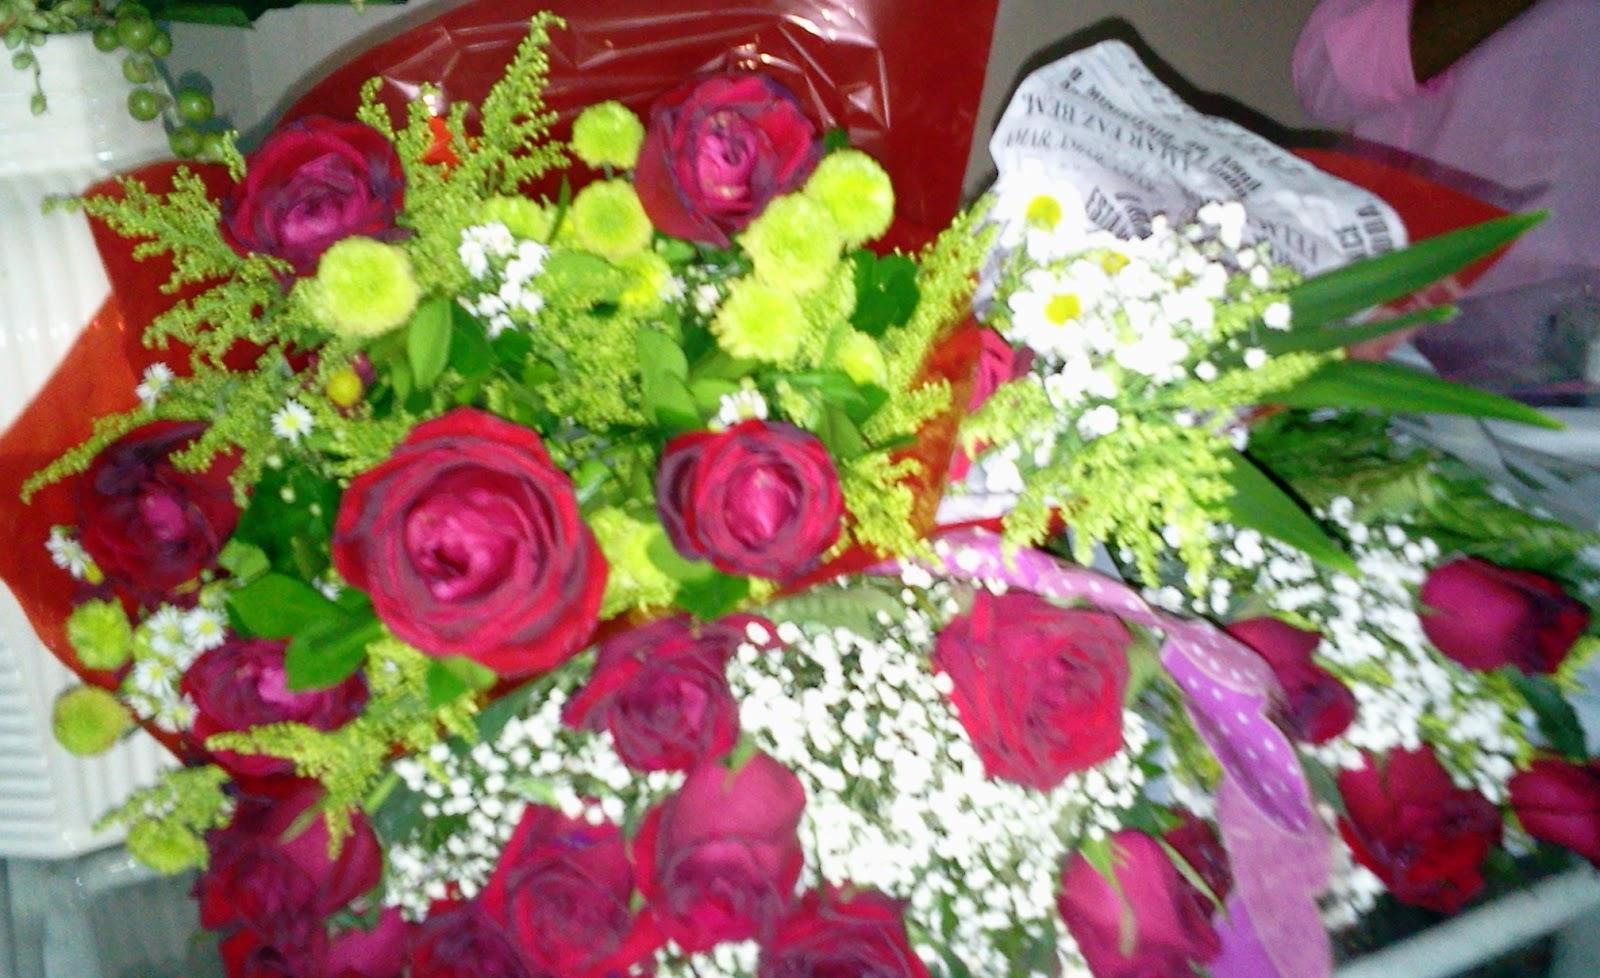 Flores Para Bens Sobrinha: Piauí Terra Querida!: Parabéns